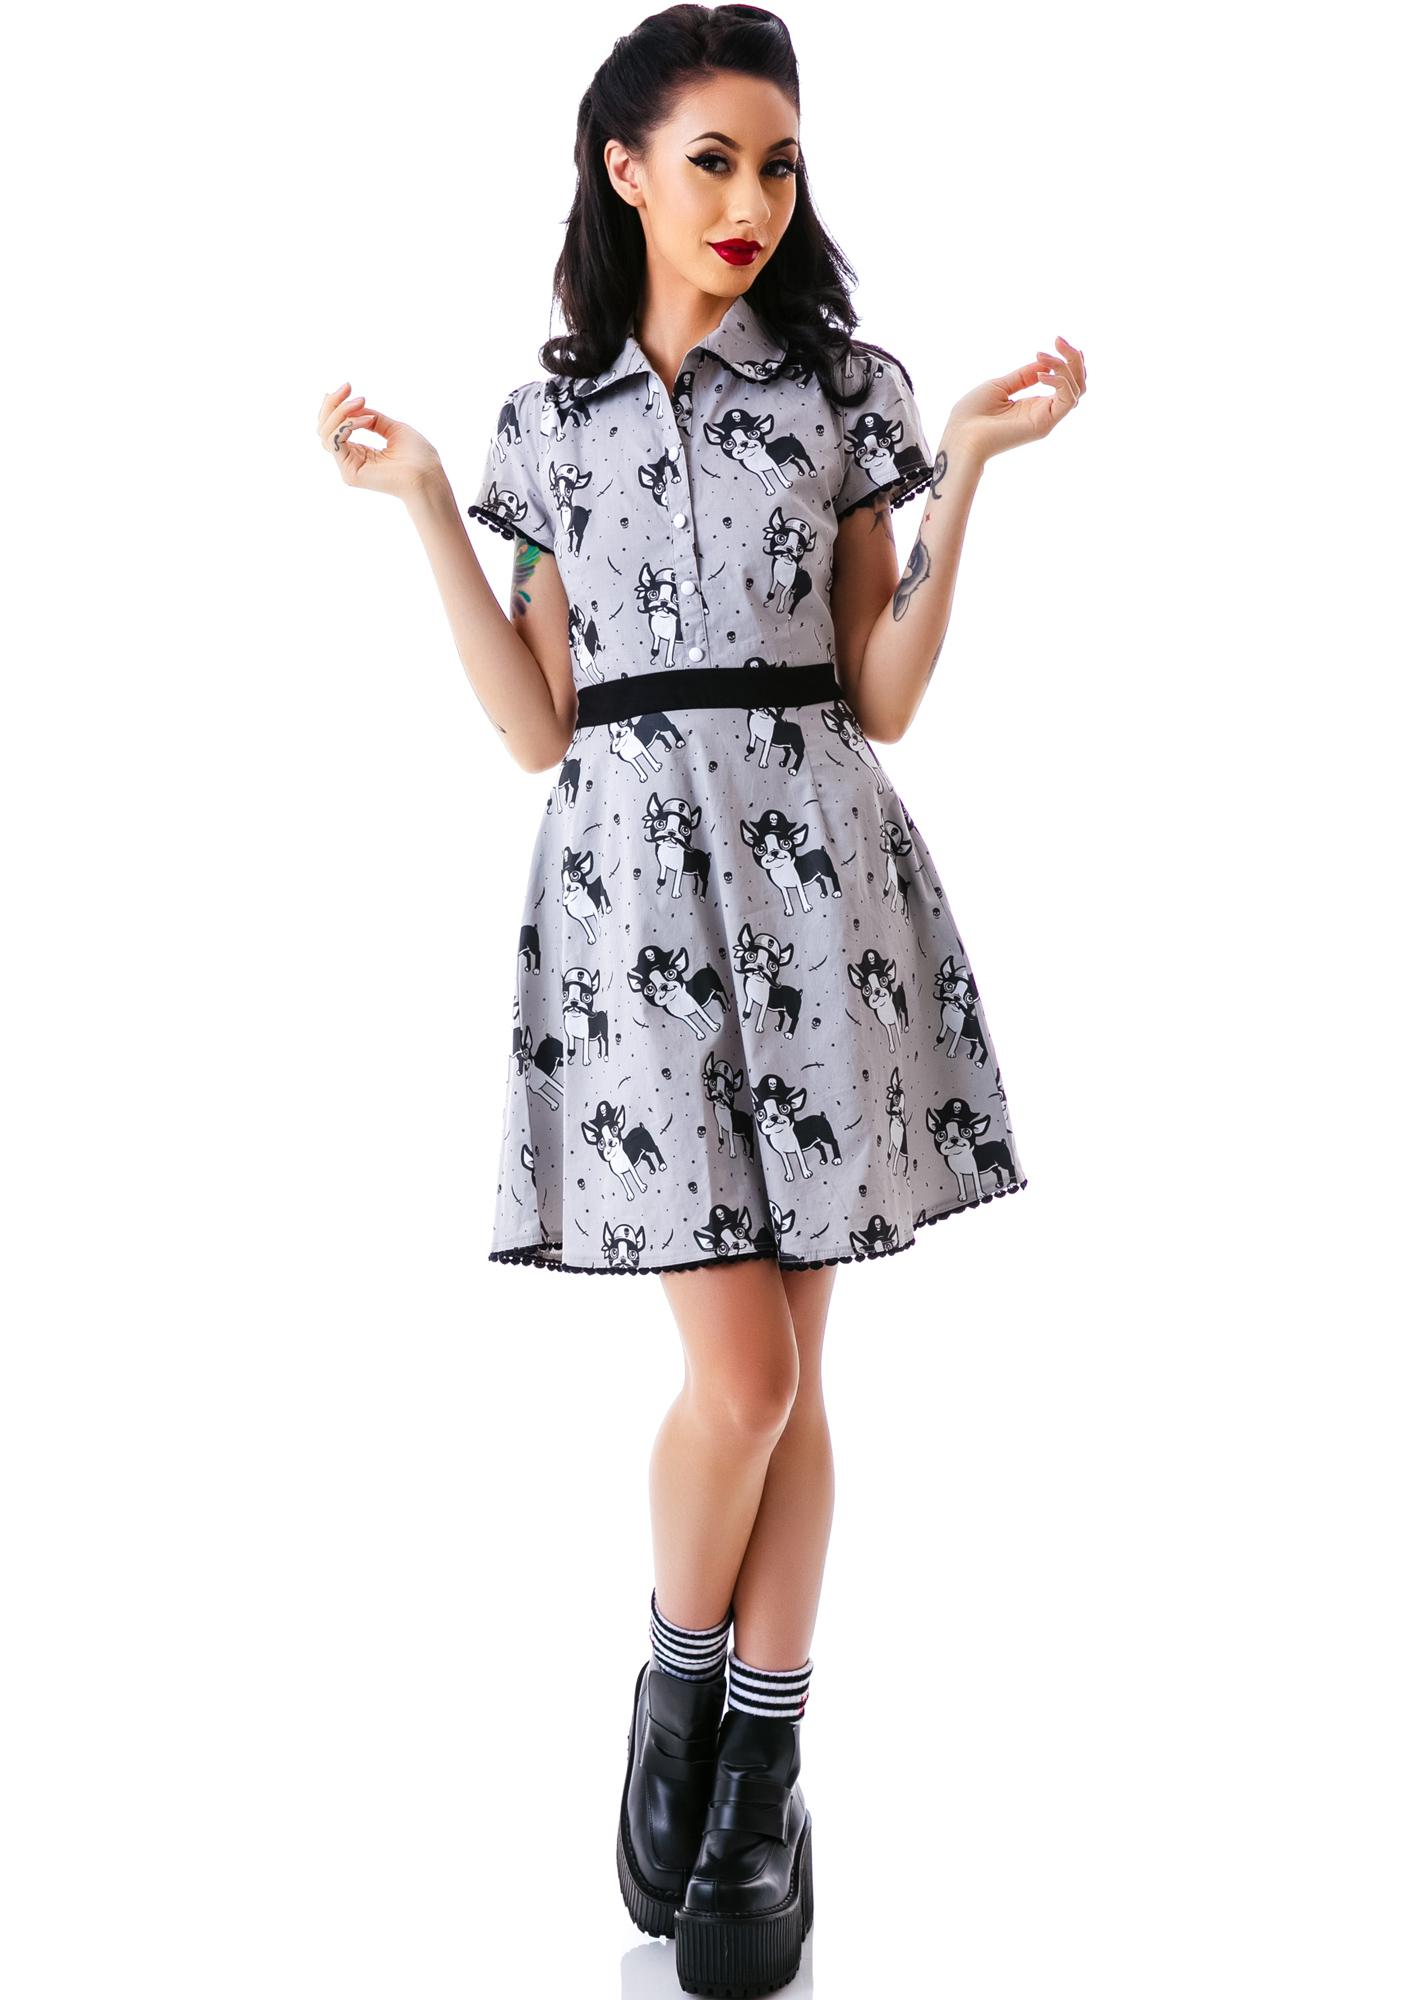 Sourpuss Clothing Rizzo Puppies Dress